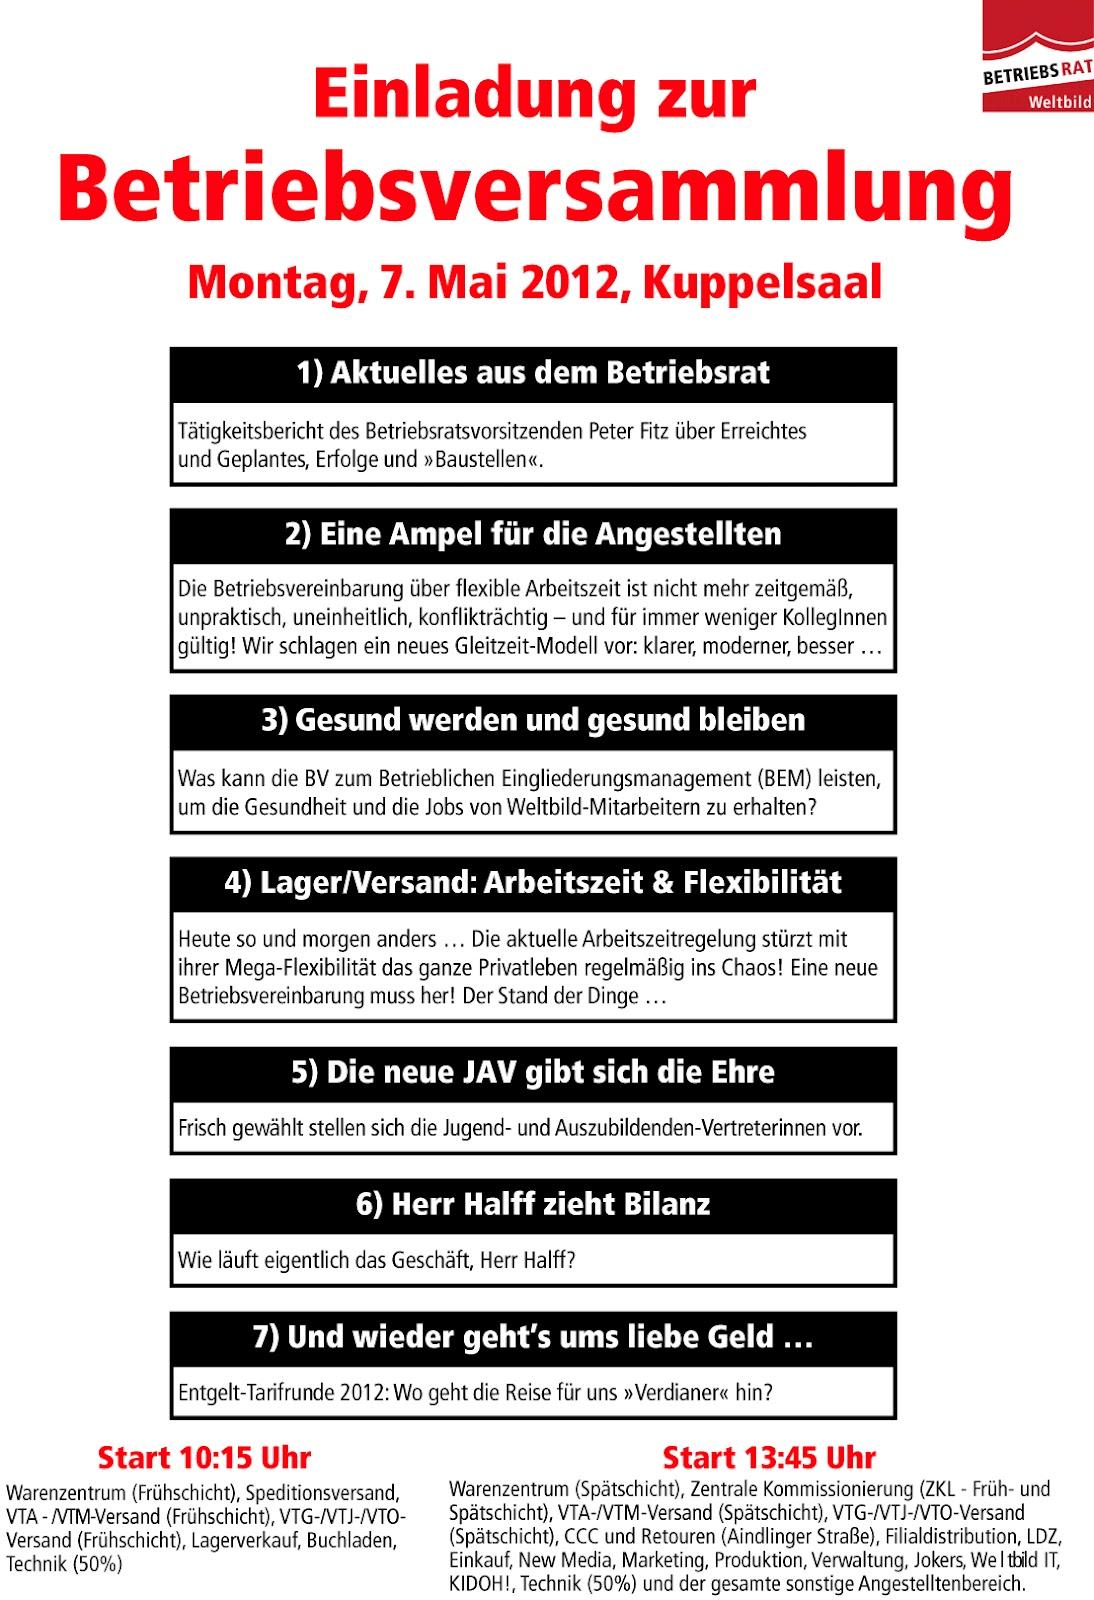 weltbild verdi infoblog: mai 2012, Einladung